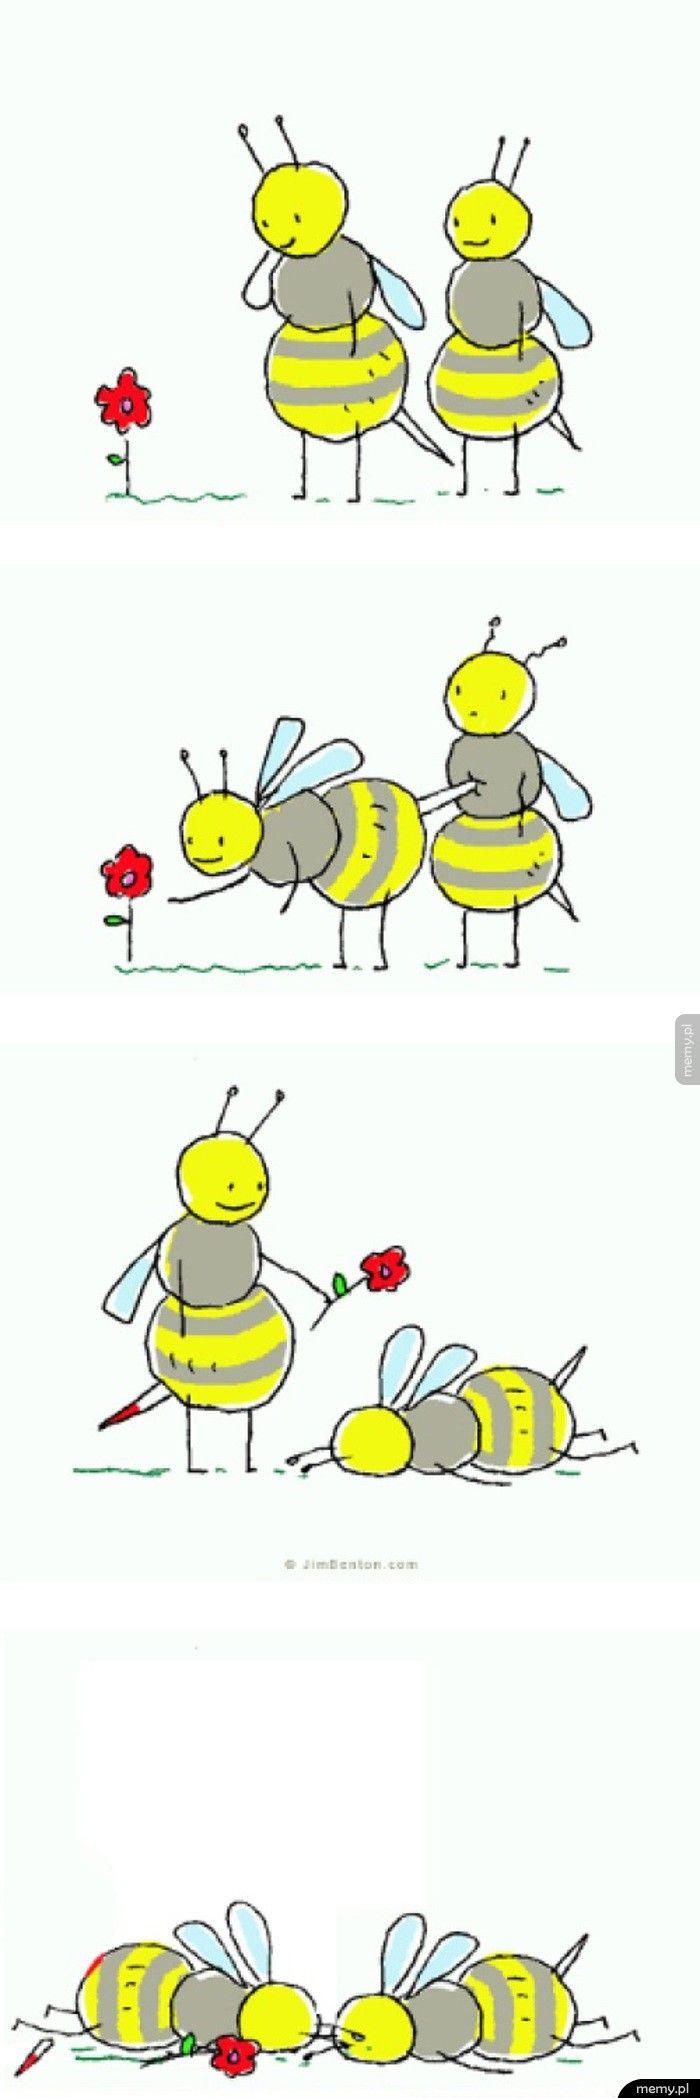 Problemy pszczół